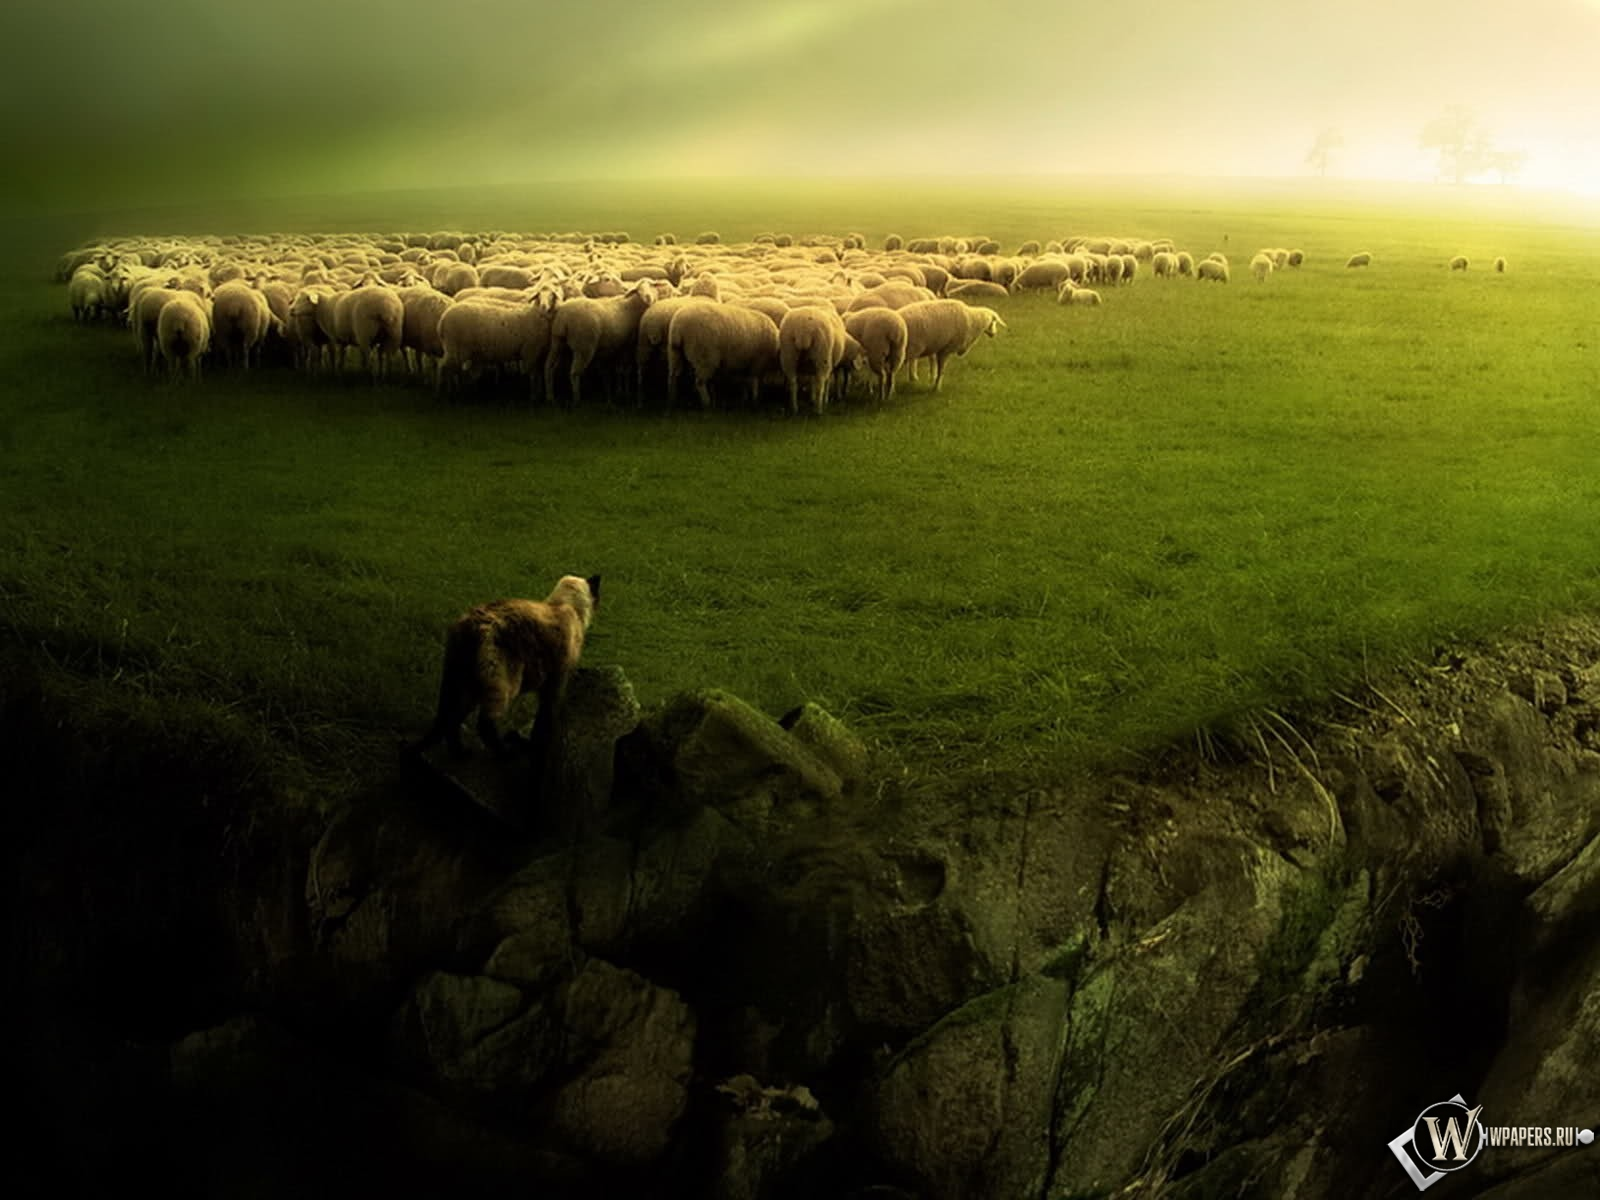 Волк и овцы 1600x1200